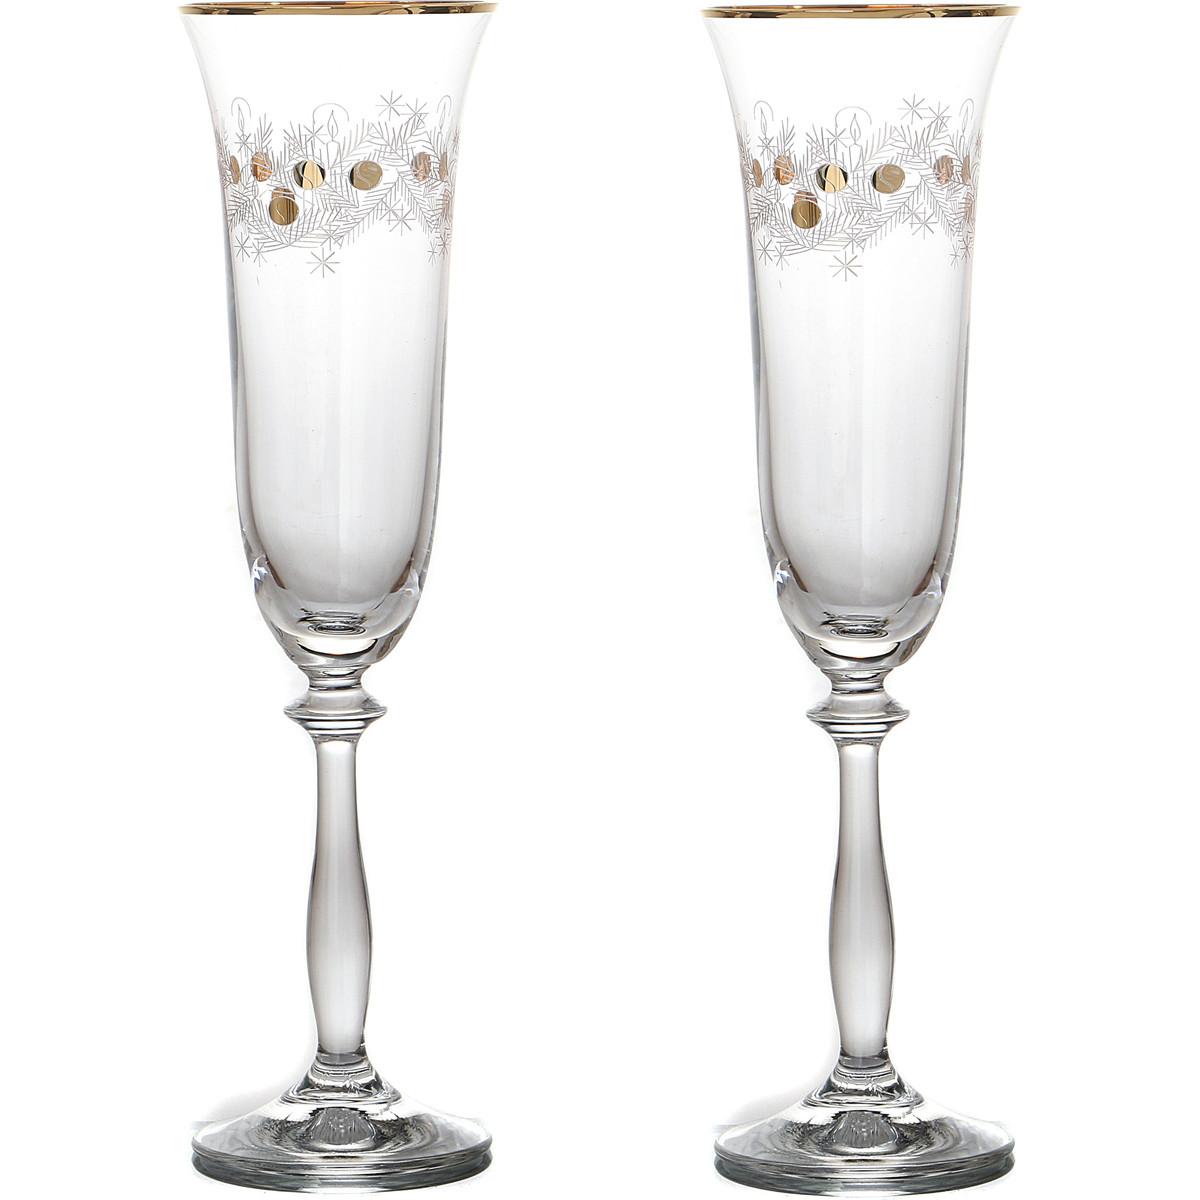 {} Bohemia Crystal Набор бокалов для шампанского Alivia  (25 см - 2 шт) набор для специй crystal bohemia тыква 2 предмета